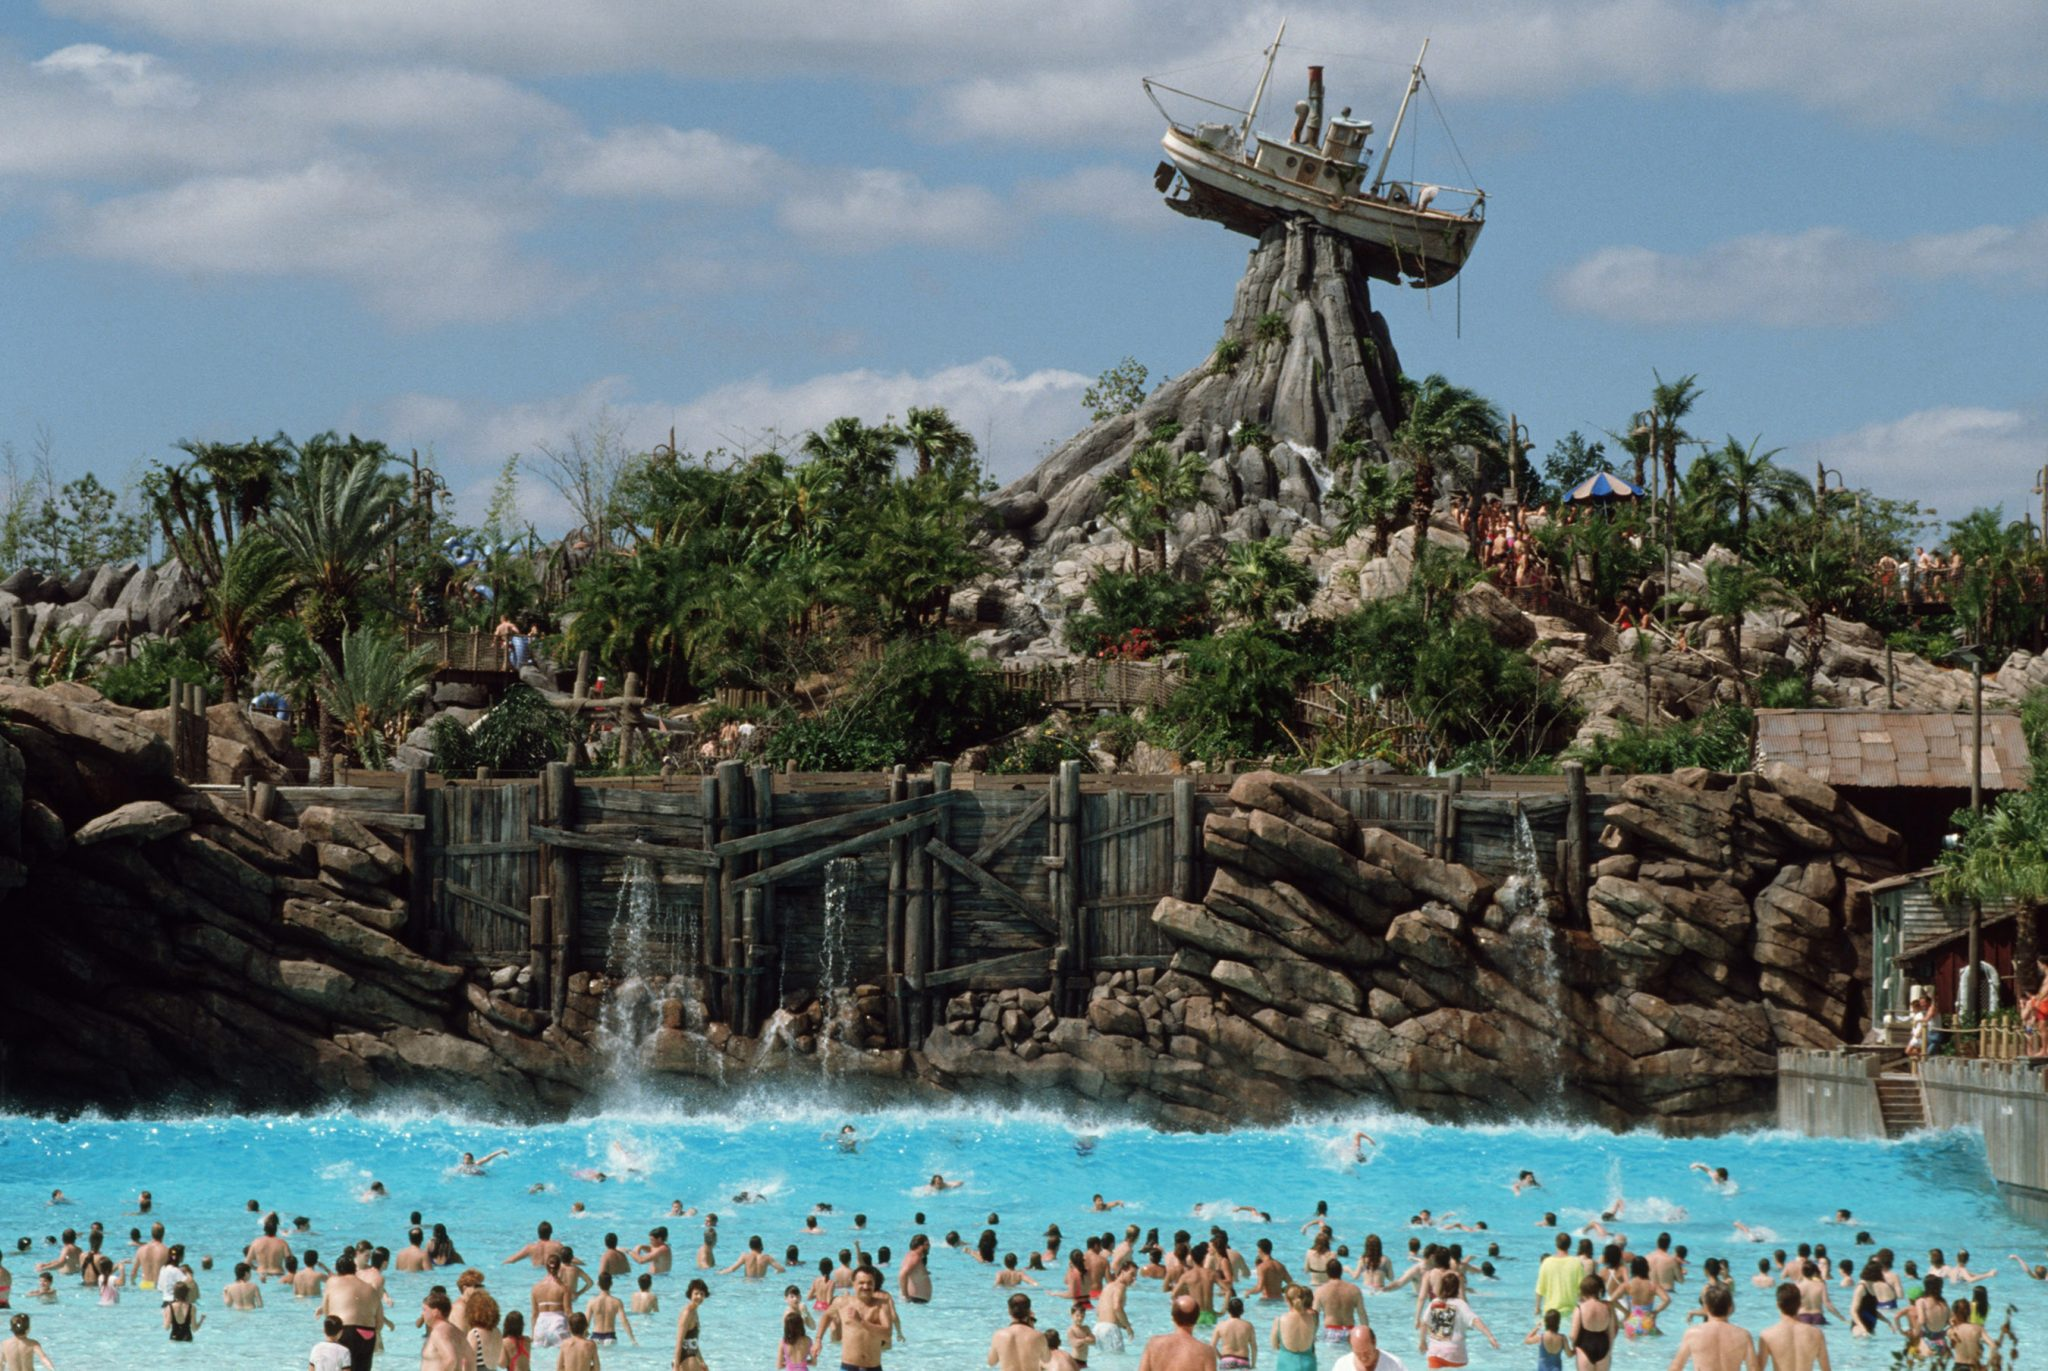 Piscina de ondas no parque Disney Typhoon Lagoon em Orlando